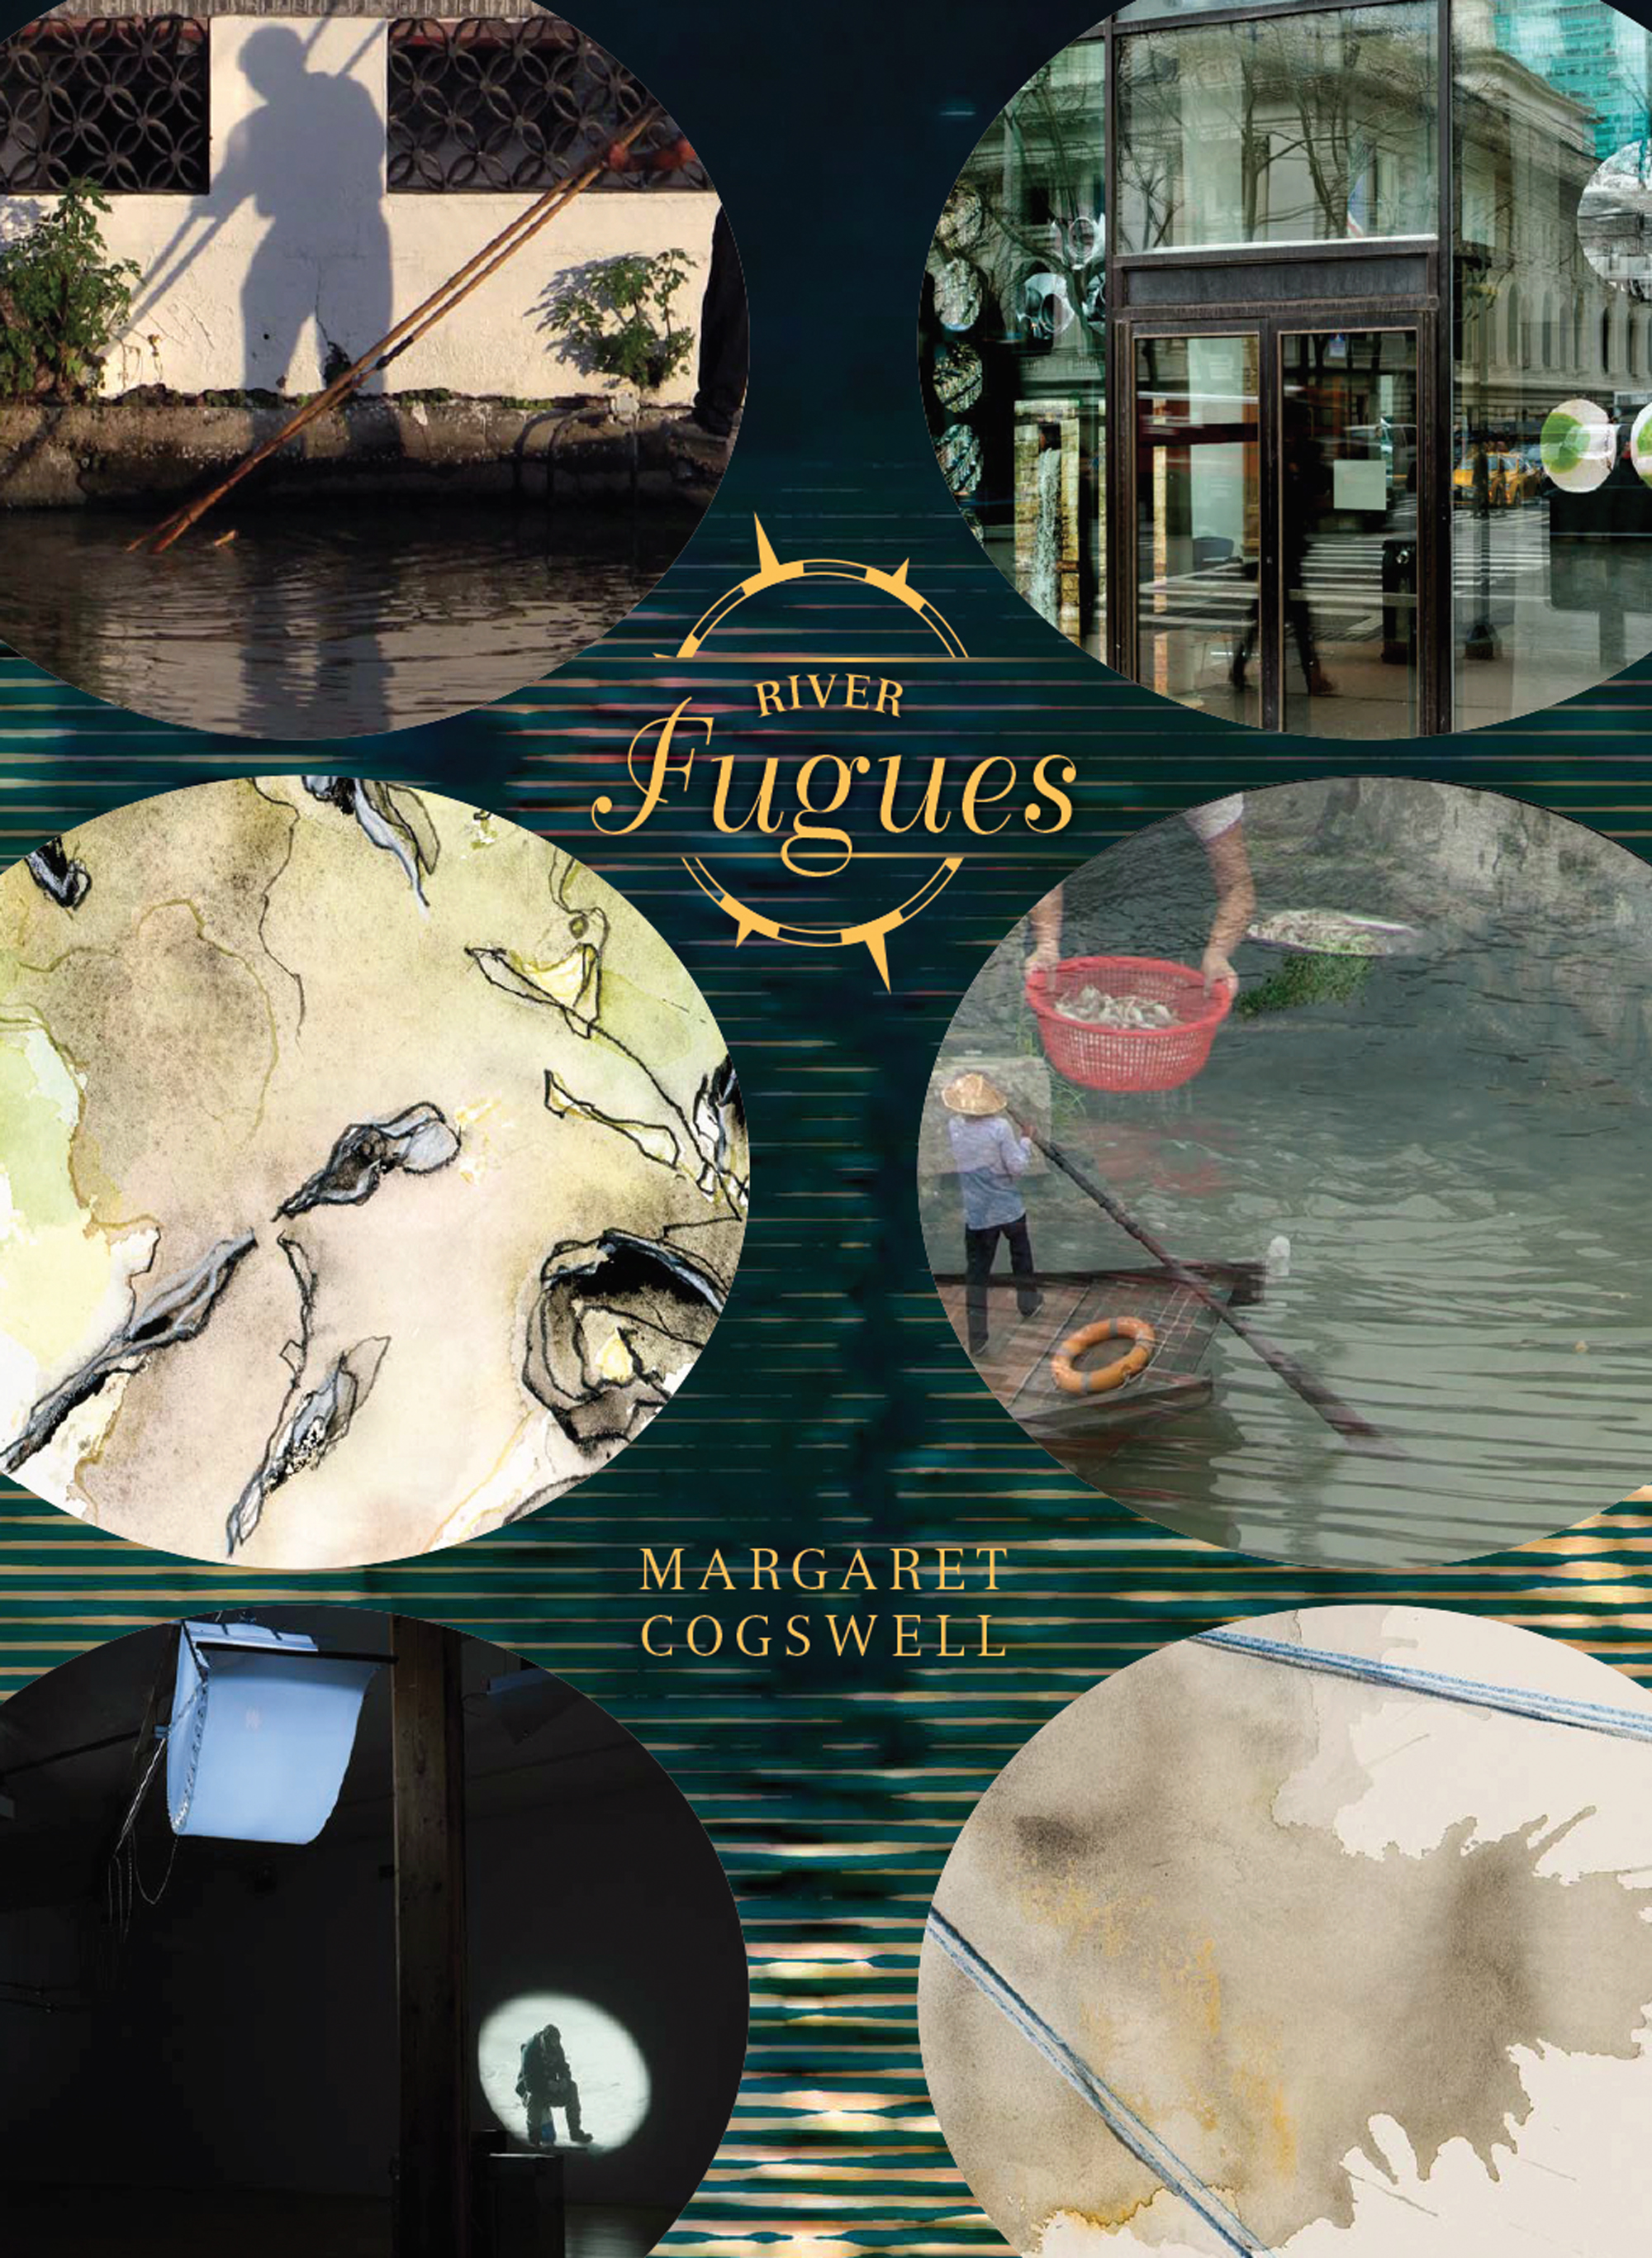 Book-cover-web-news-image.jpg